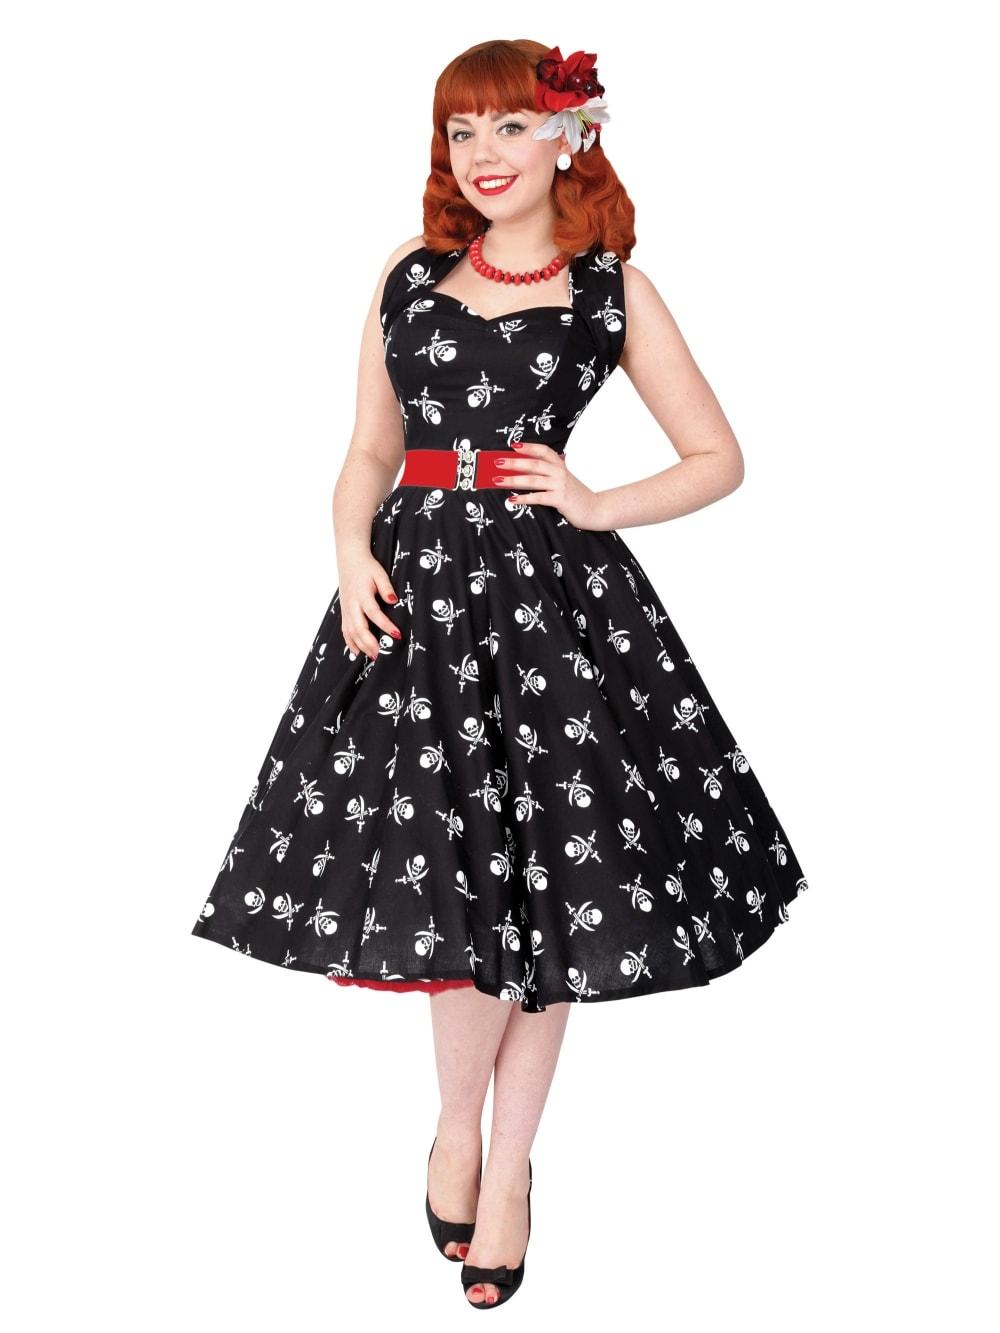 1950s Halterneck Pirate Dress From Vivien Of Holloway